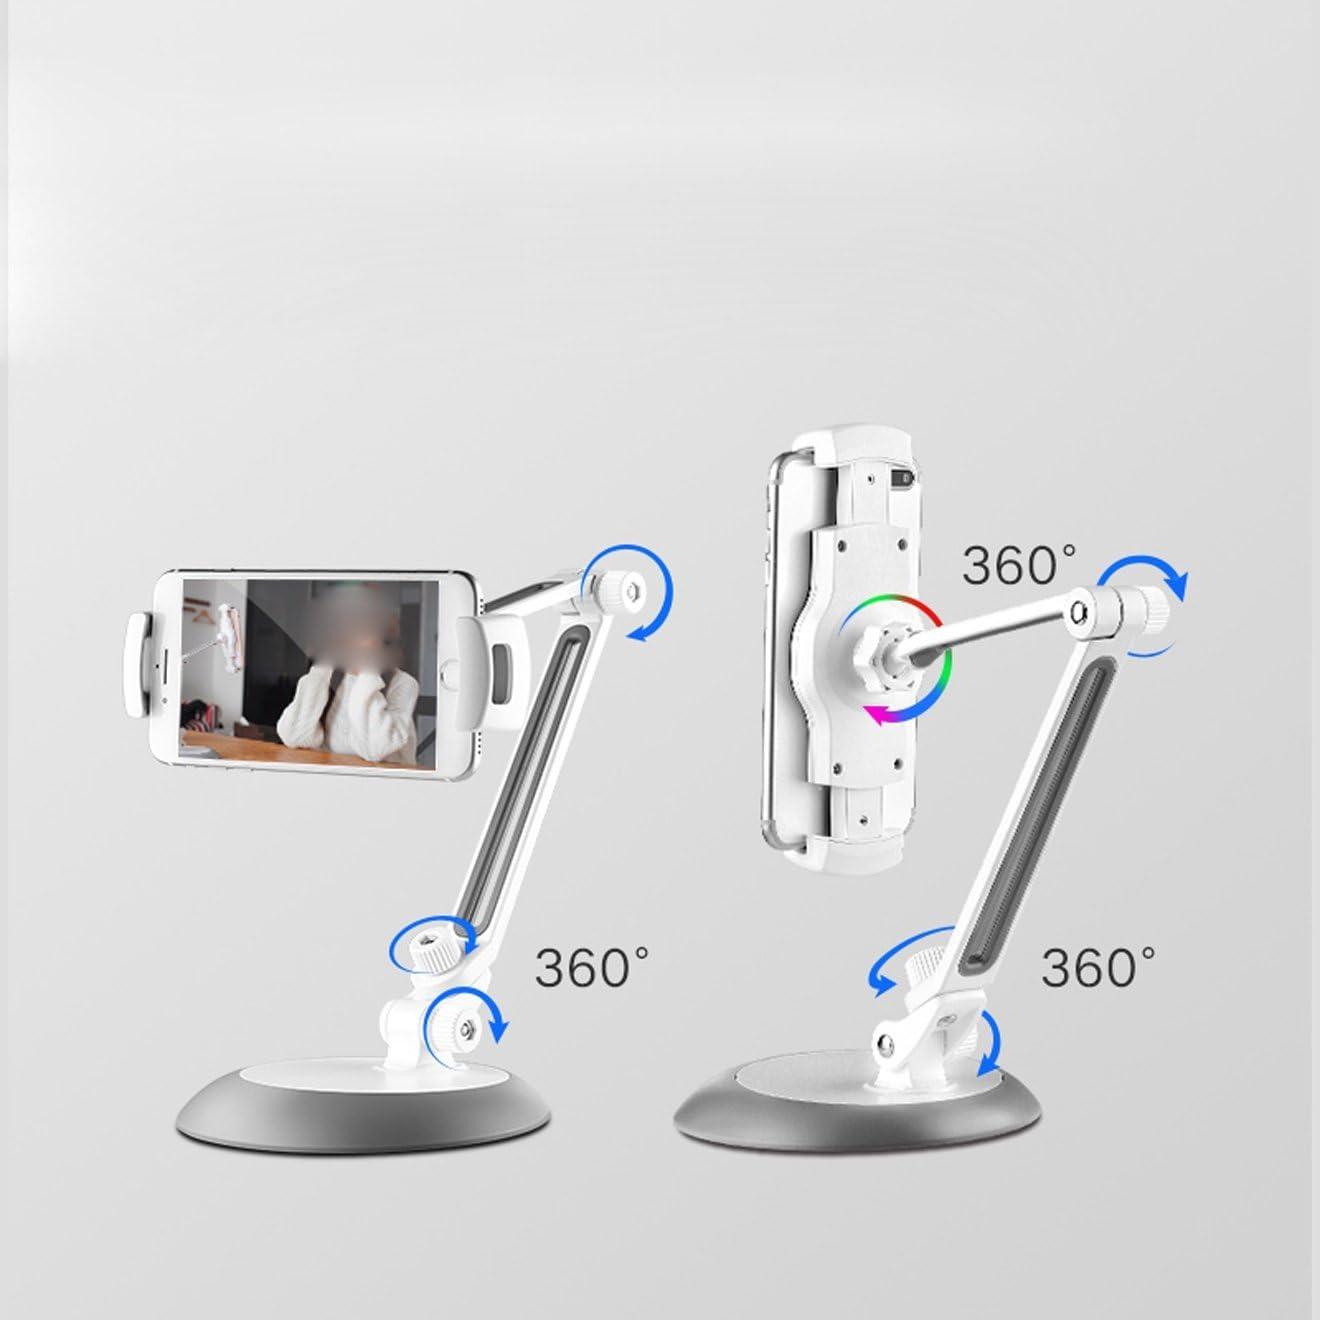 JUIANG Foldable Telescopic Mobile Phone Stand Holder Portable Tabletop Desktop Cellphone Holder Mount Bracket for Smart Phones